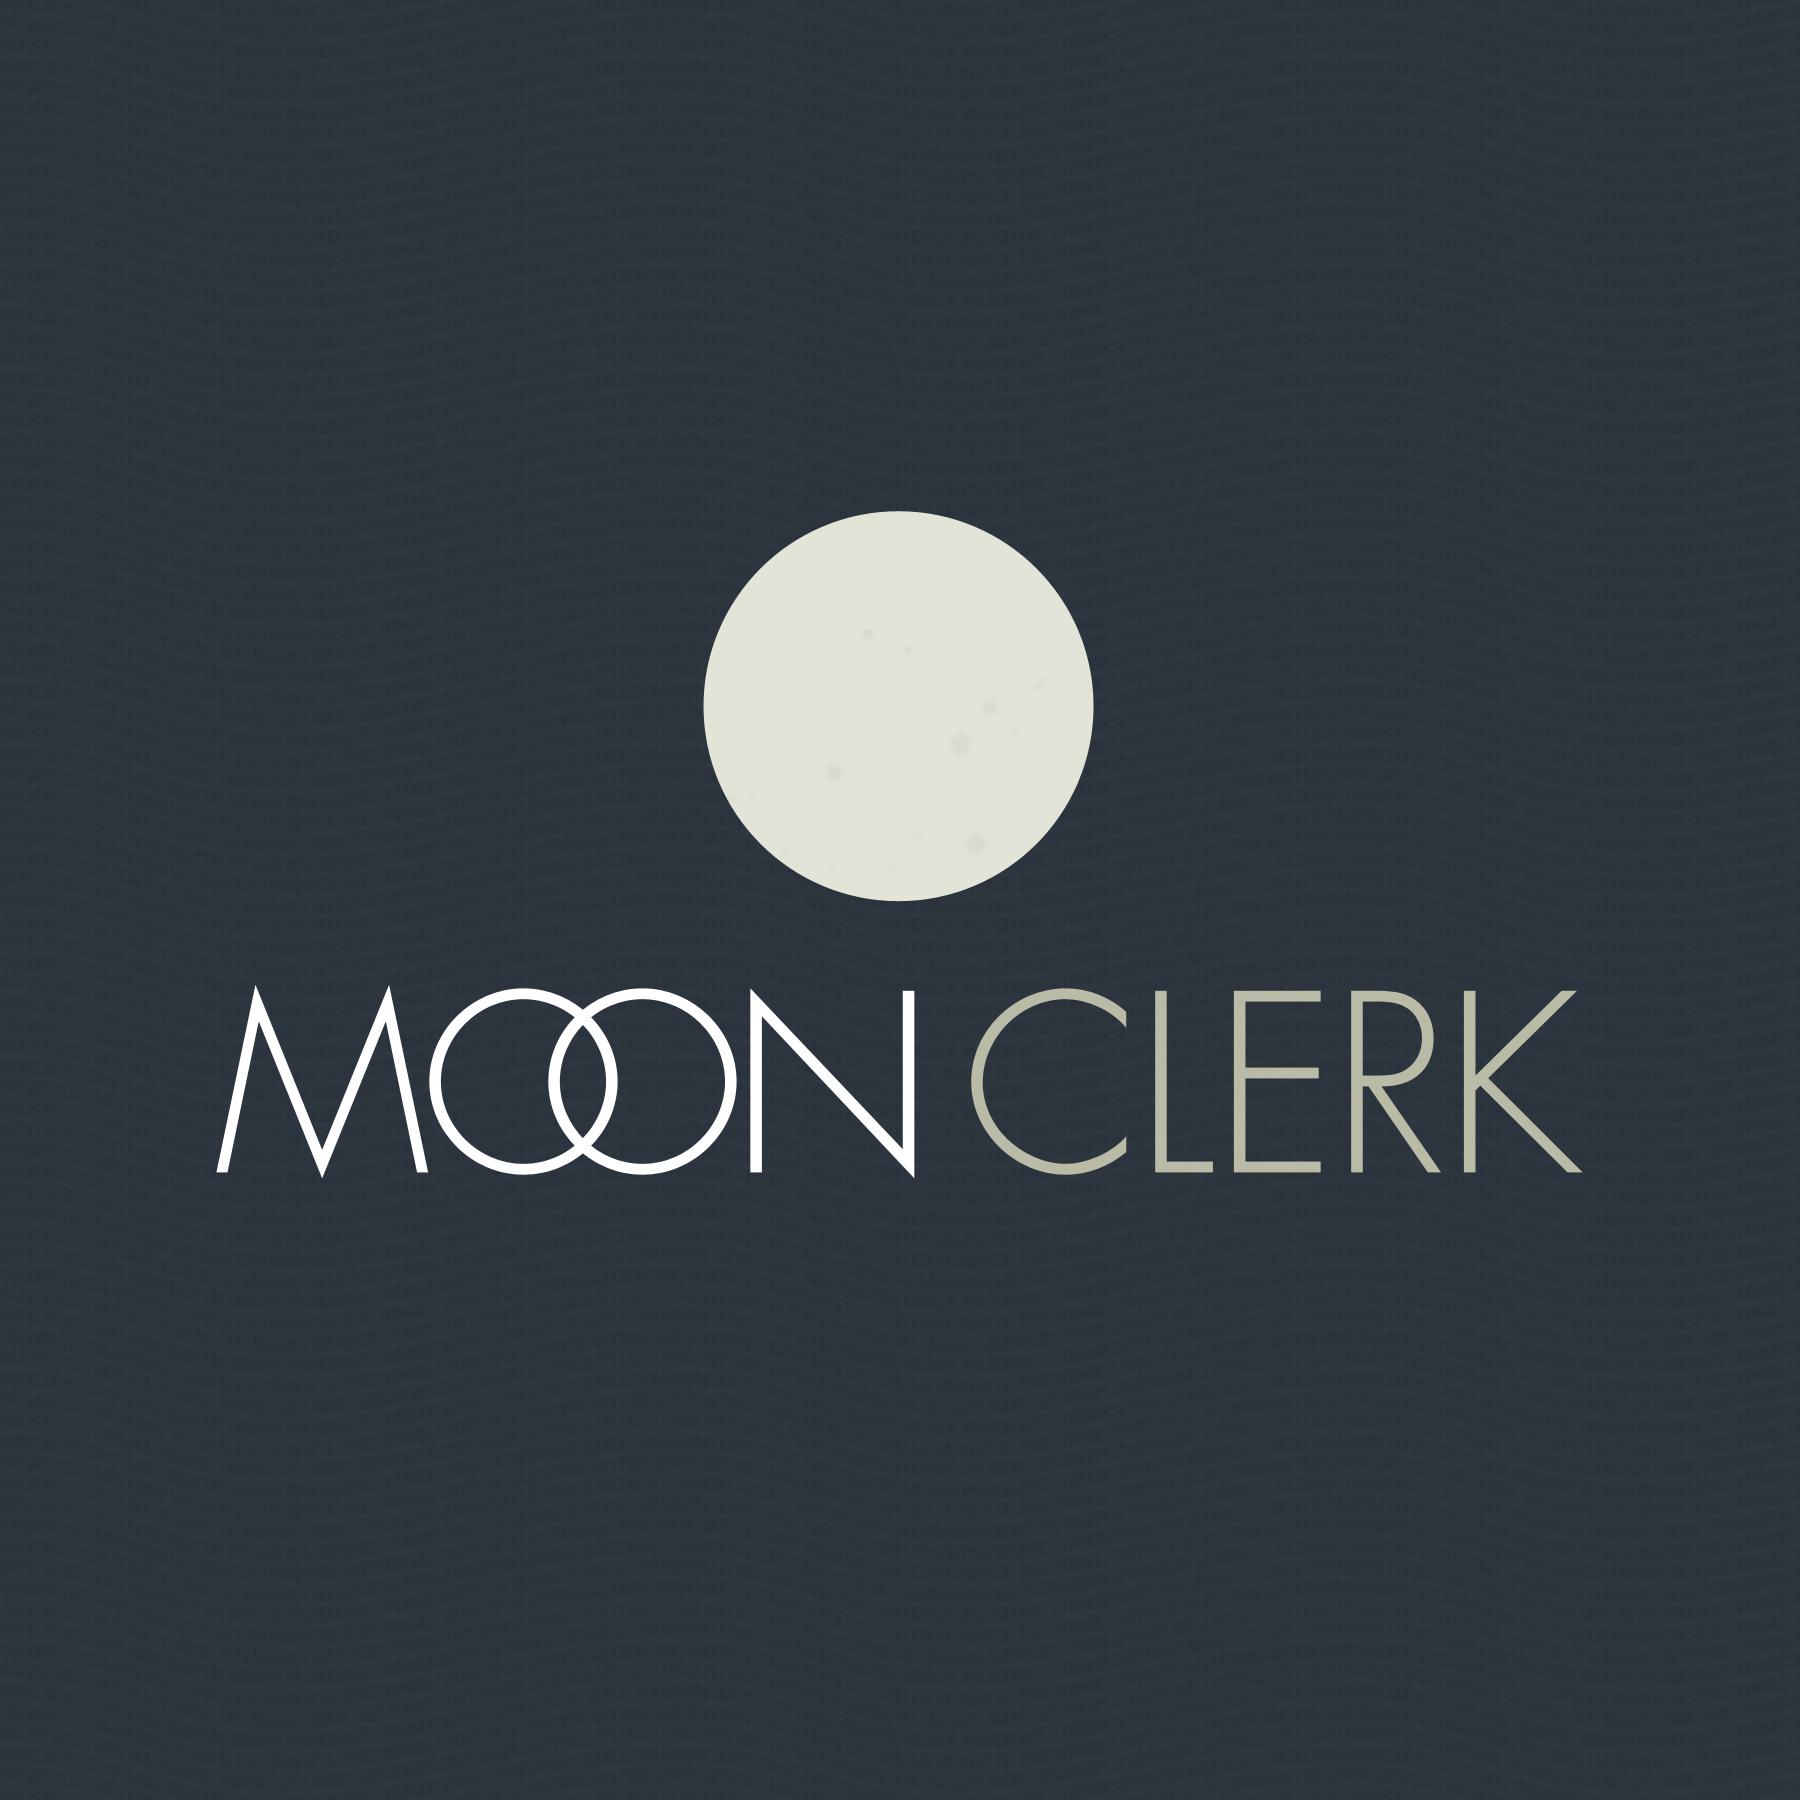 Moonclerk 1479310786 logo